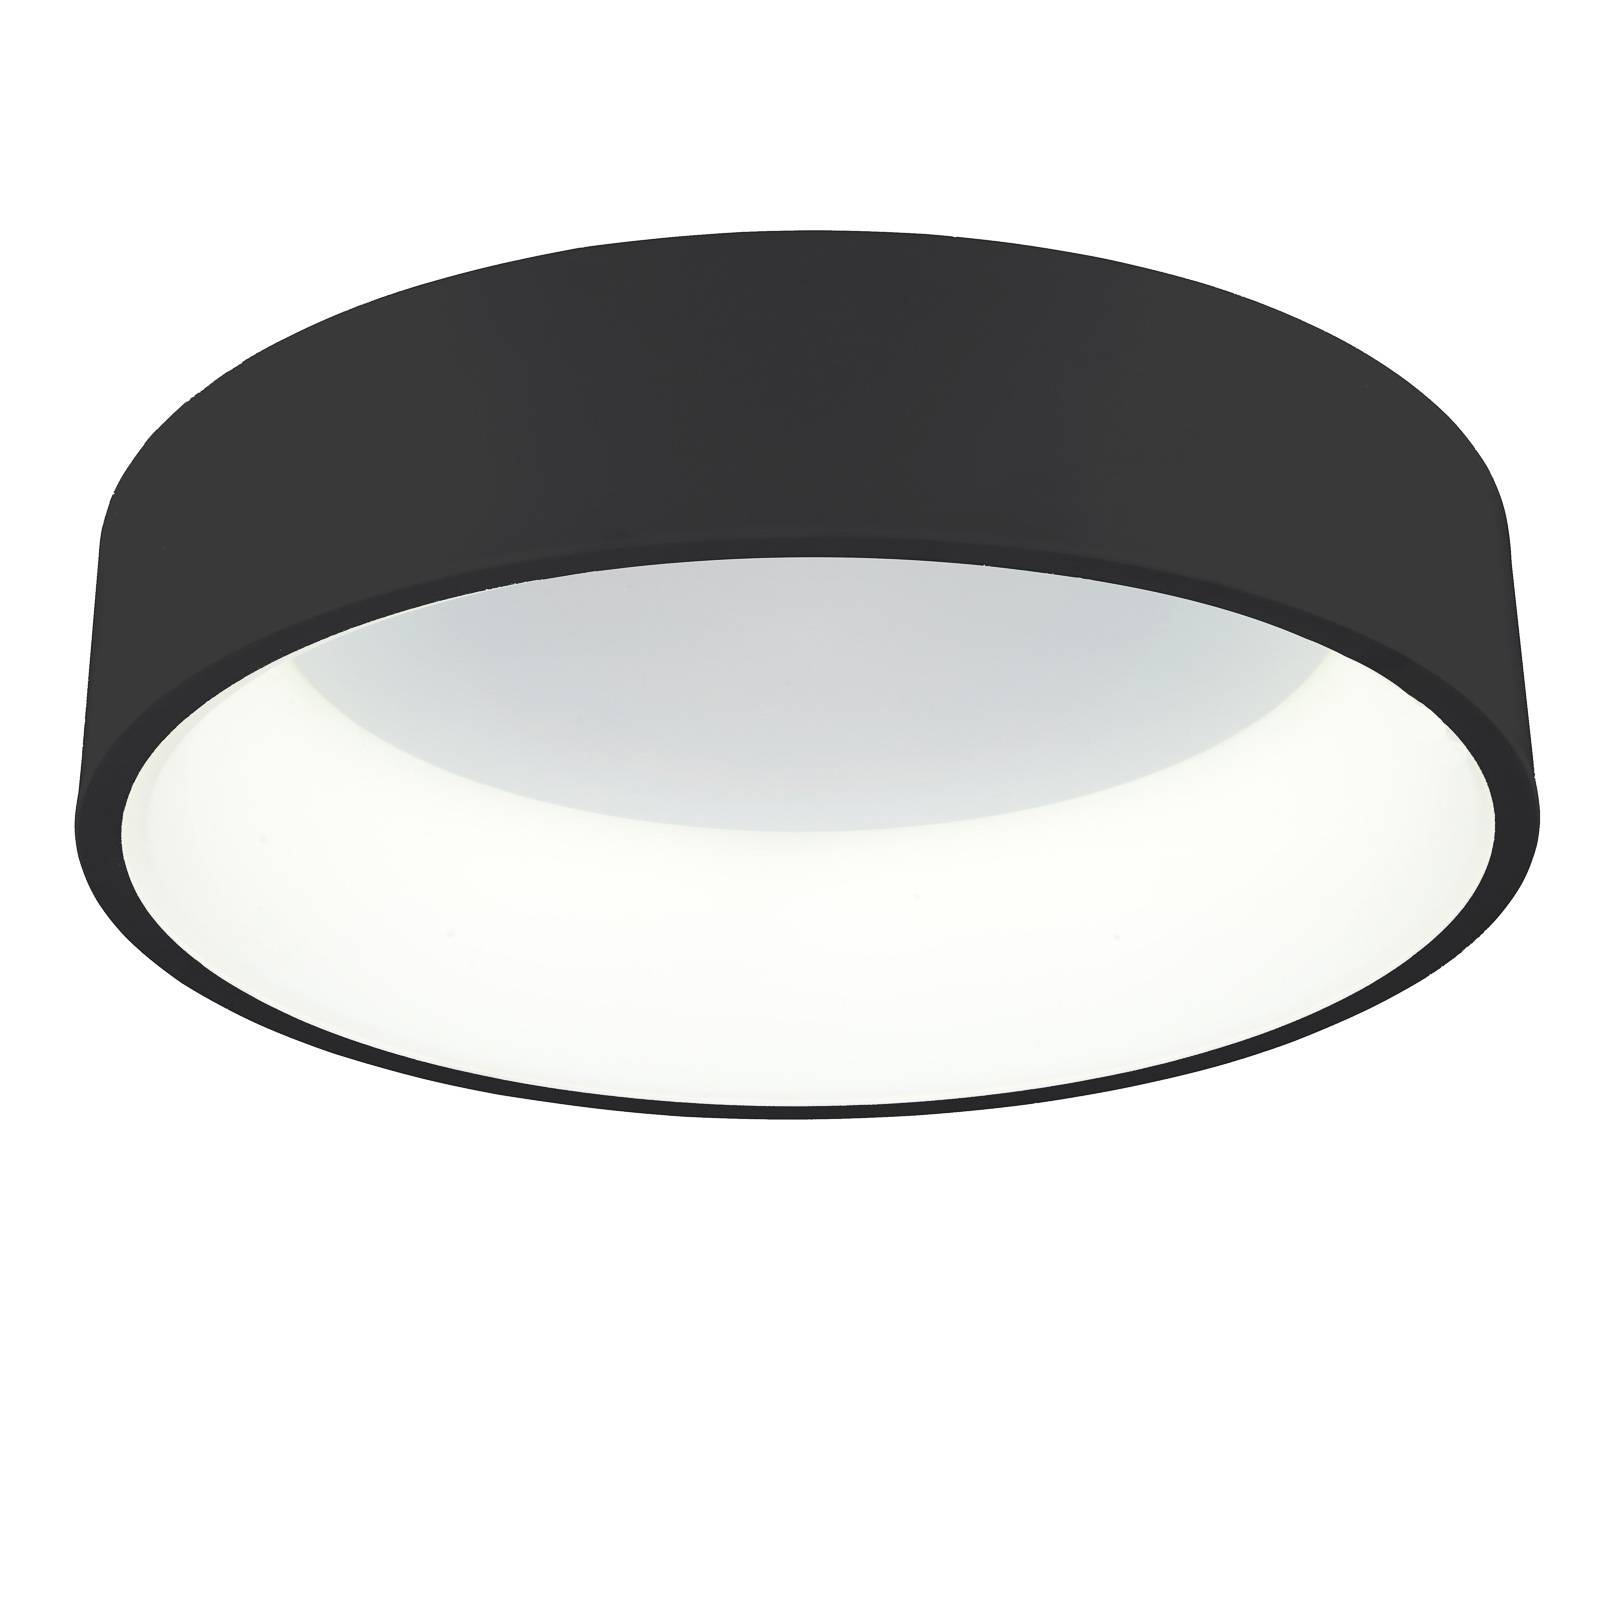 Arcchio Aleksi -LED-kattovalaisin, Ø 45 cm, pyöreä